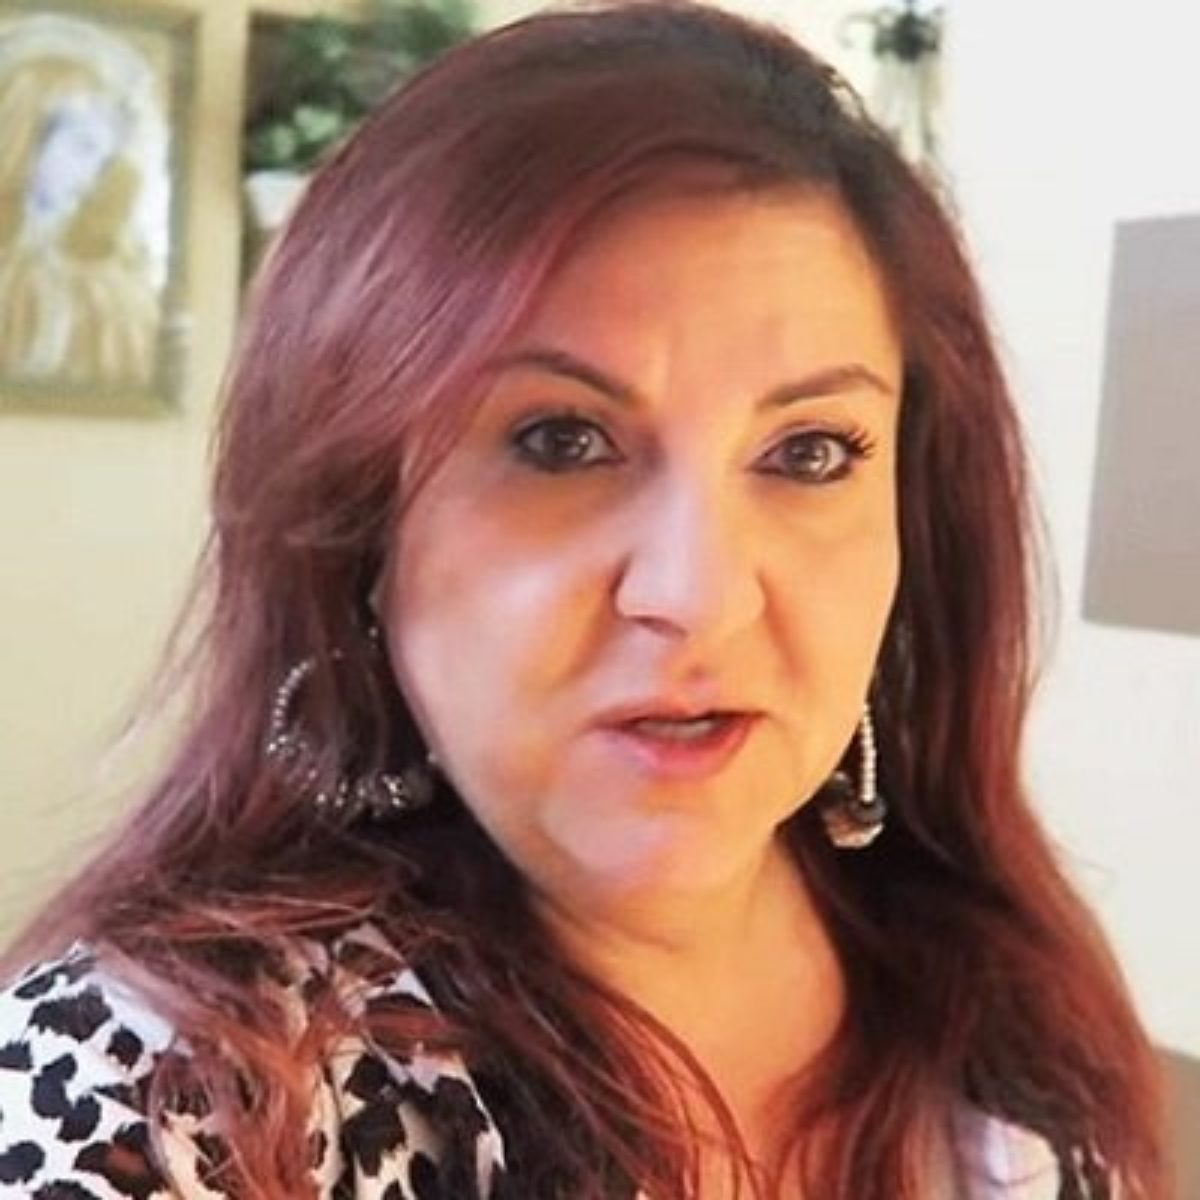 Mama Rug Biography - Affair, Married